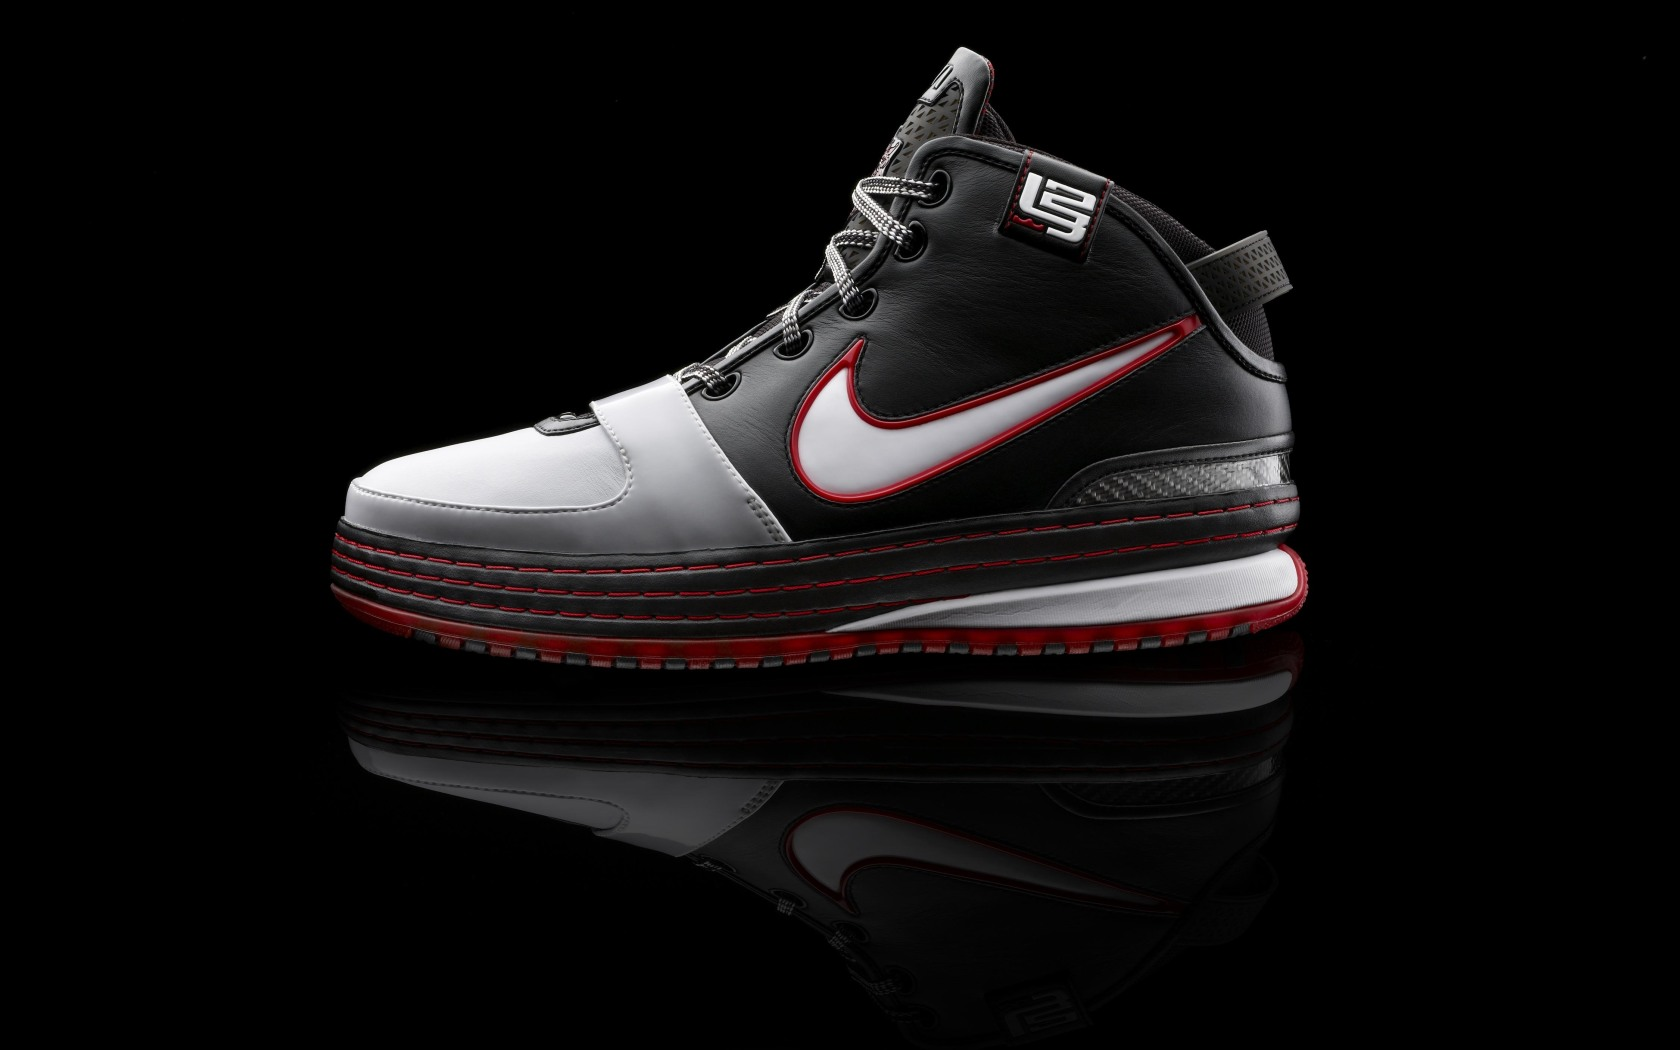 Lebron James Shoes | Wallpup.com